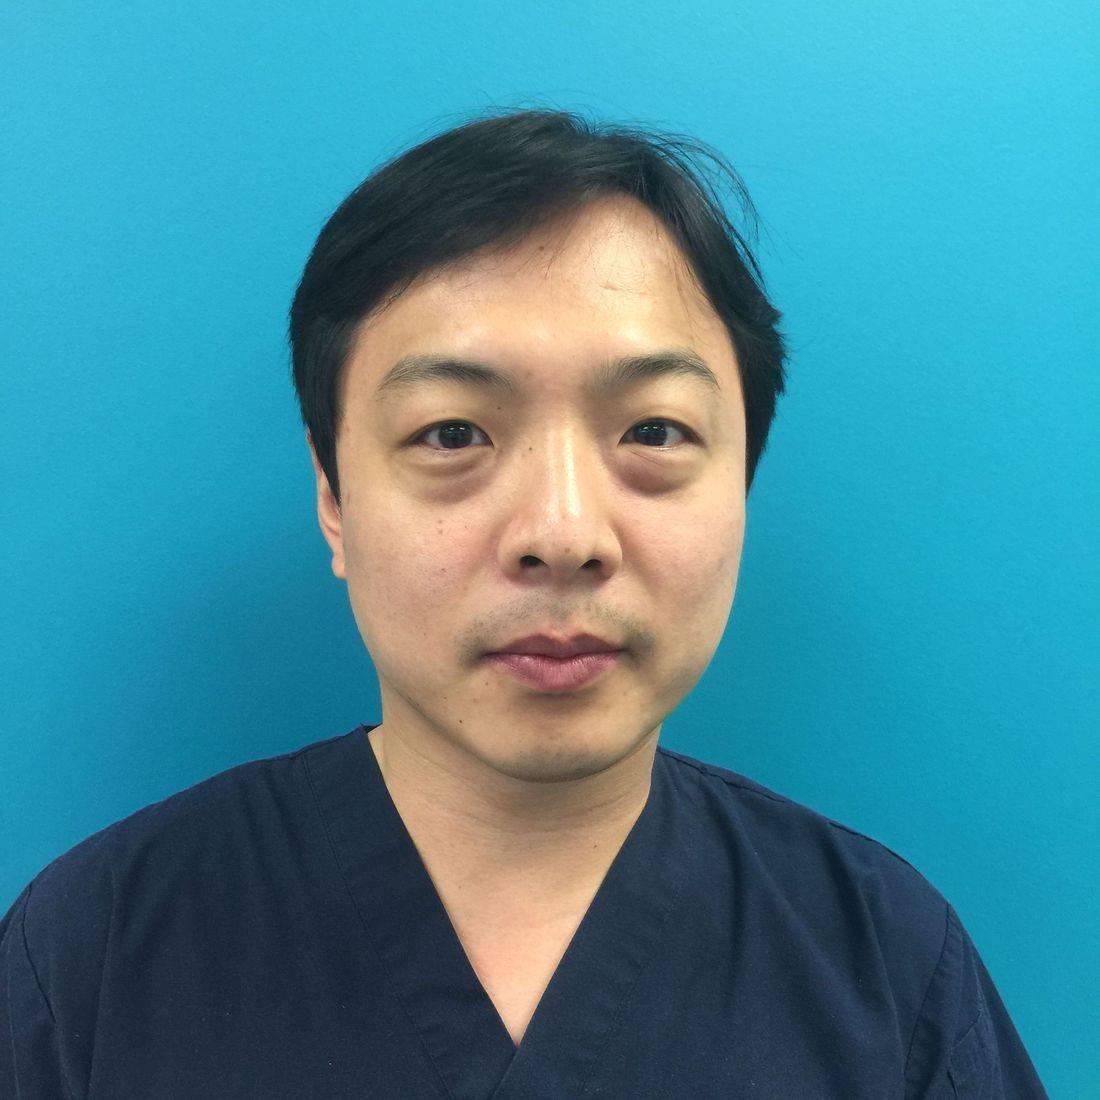 Doctor of TCM, Registered Acupuncturist Surrey